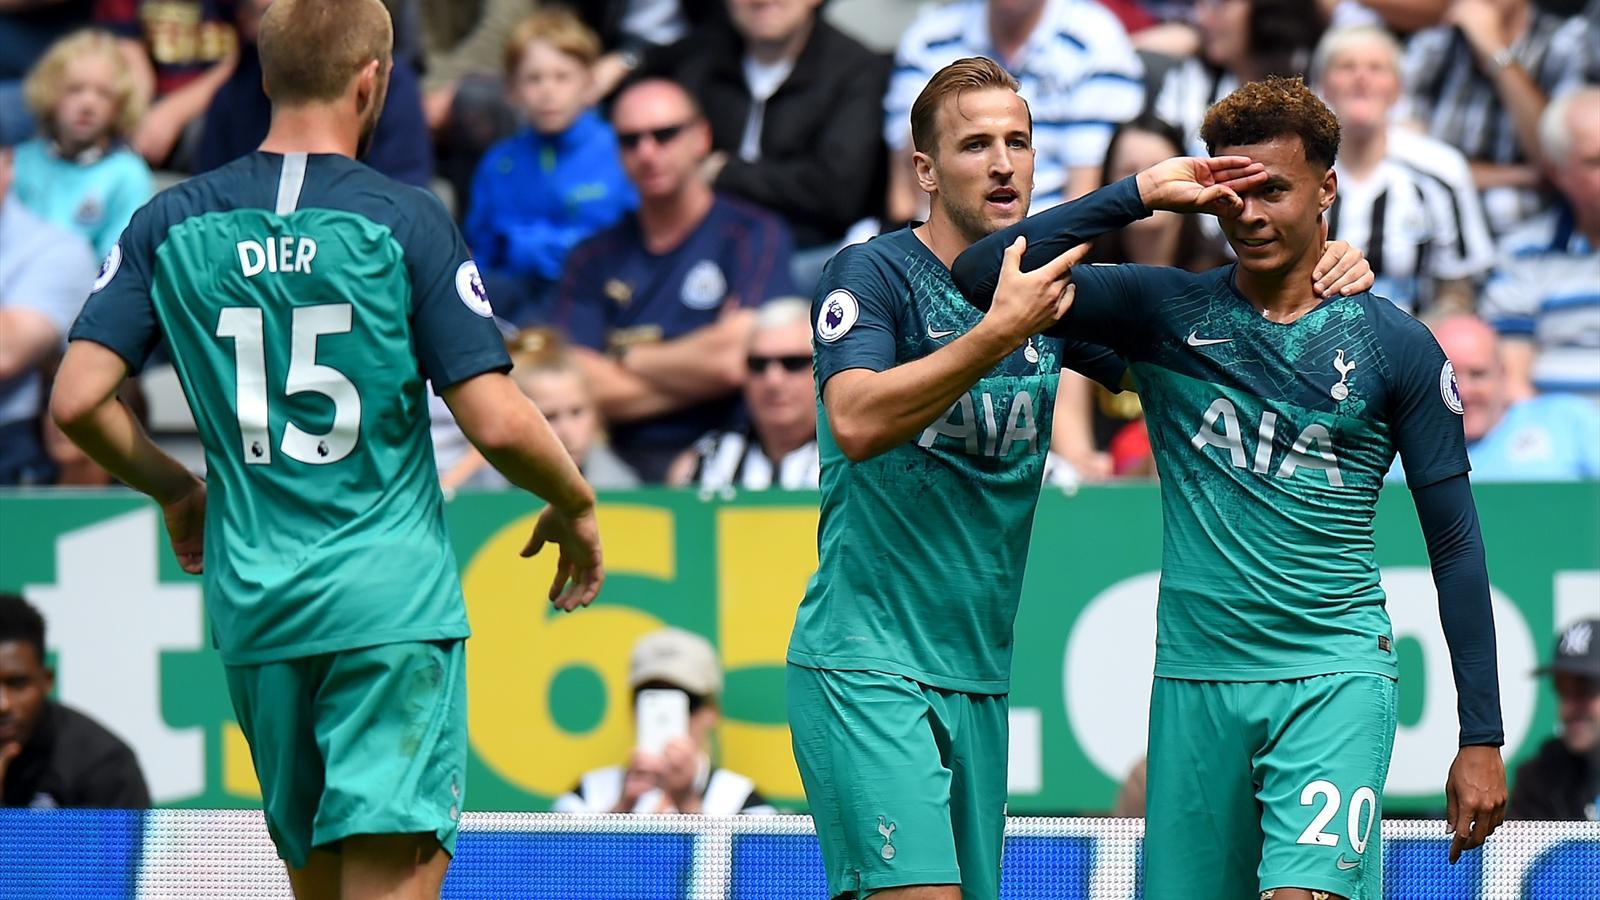 Premier League: Dele Alli header helps Tottenham Hotspur beat Newcastle United in opening game ...